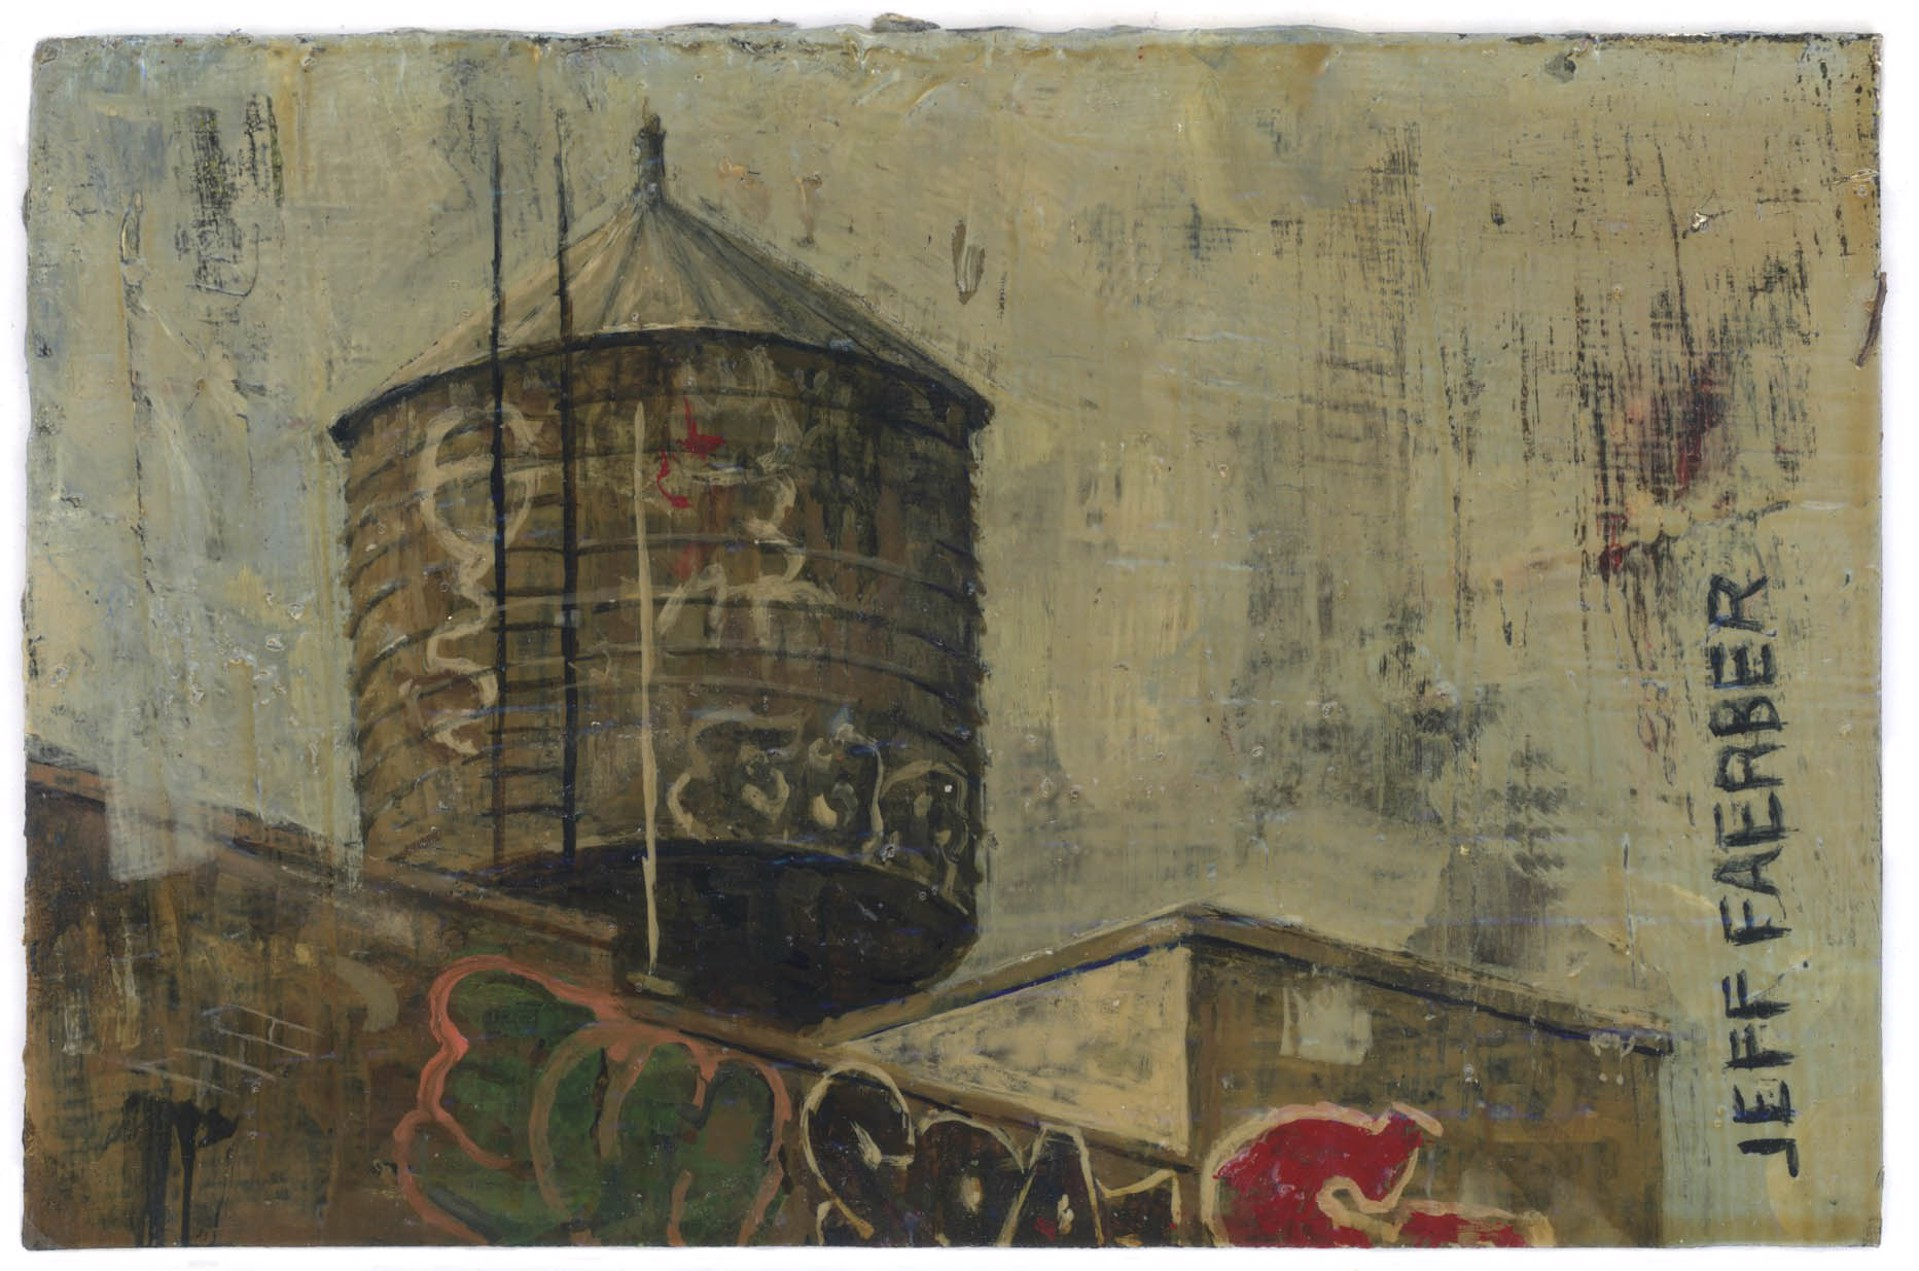 Graffiti Tower by Jeff Faerber